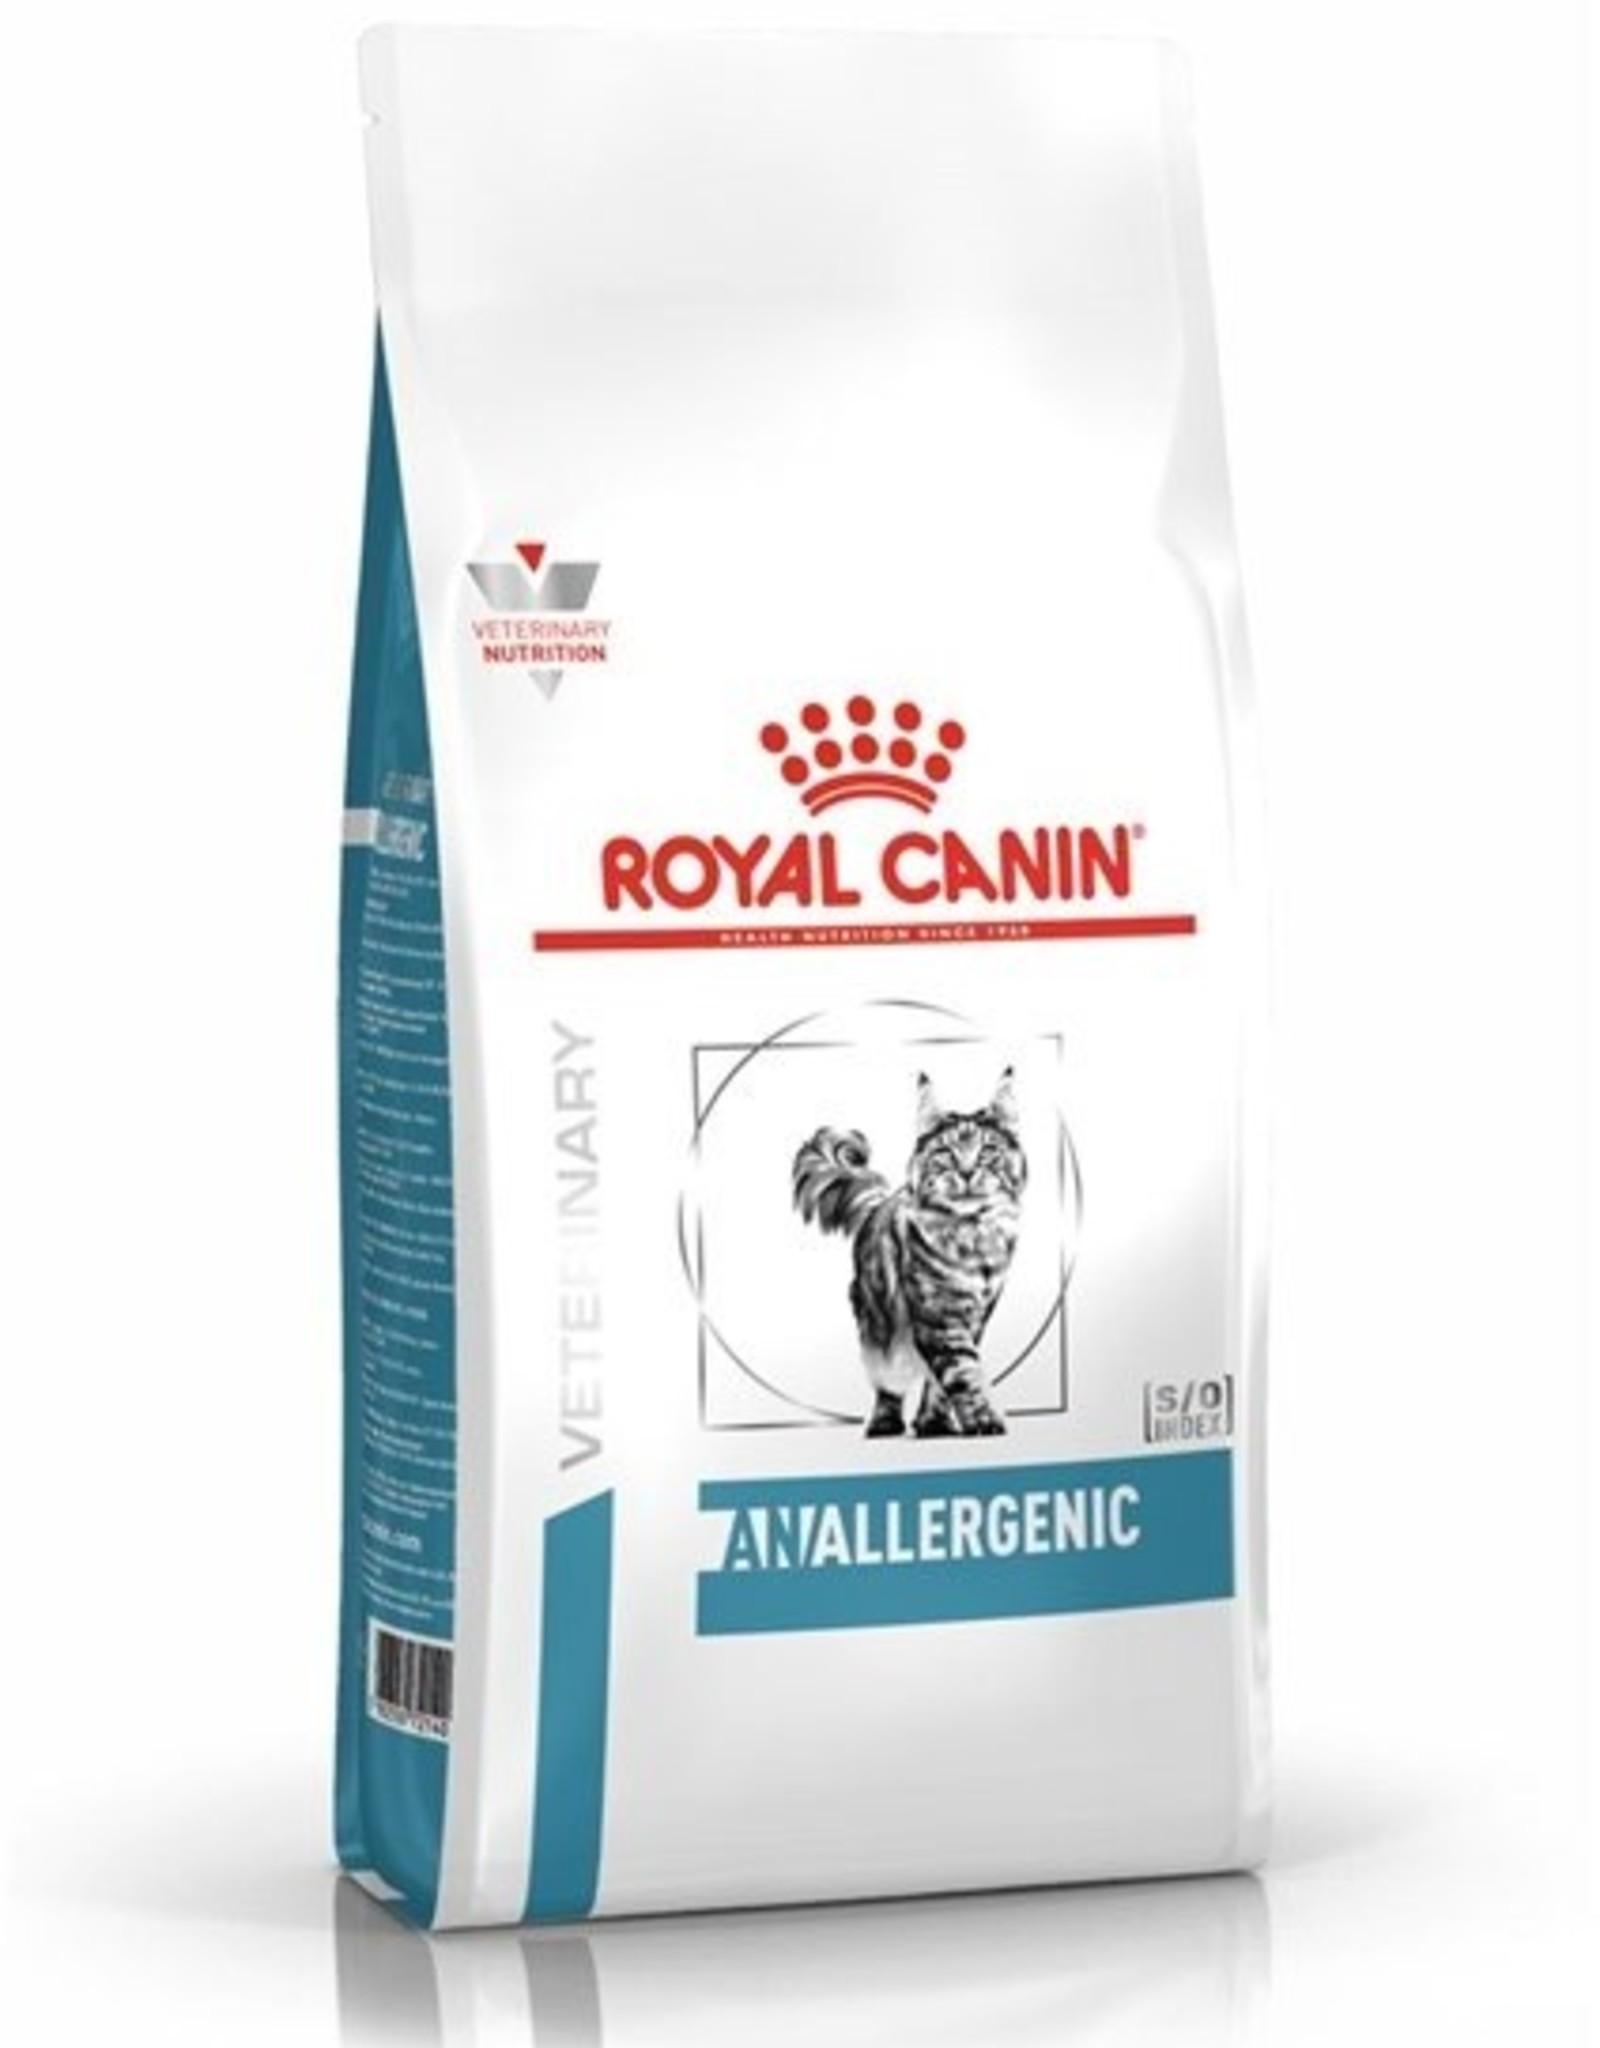 Royal Canin Royal Canin Anallergenic Katze 4kg